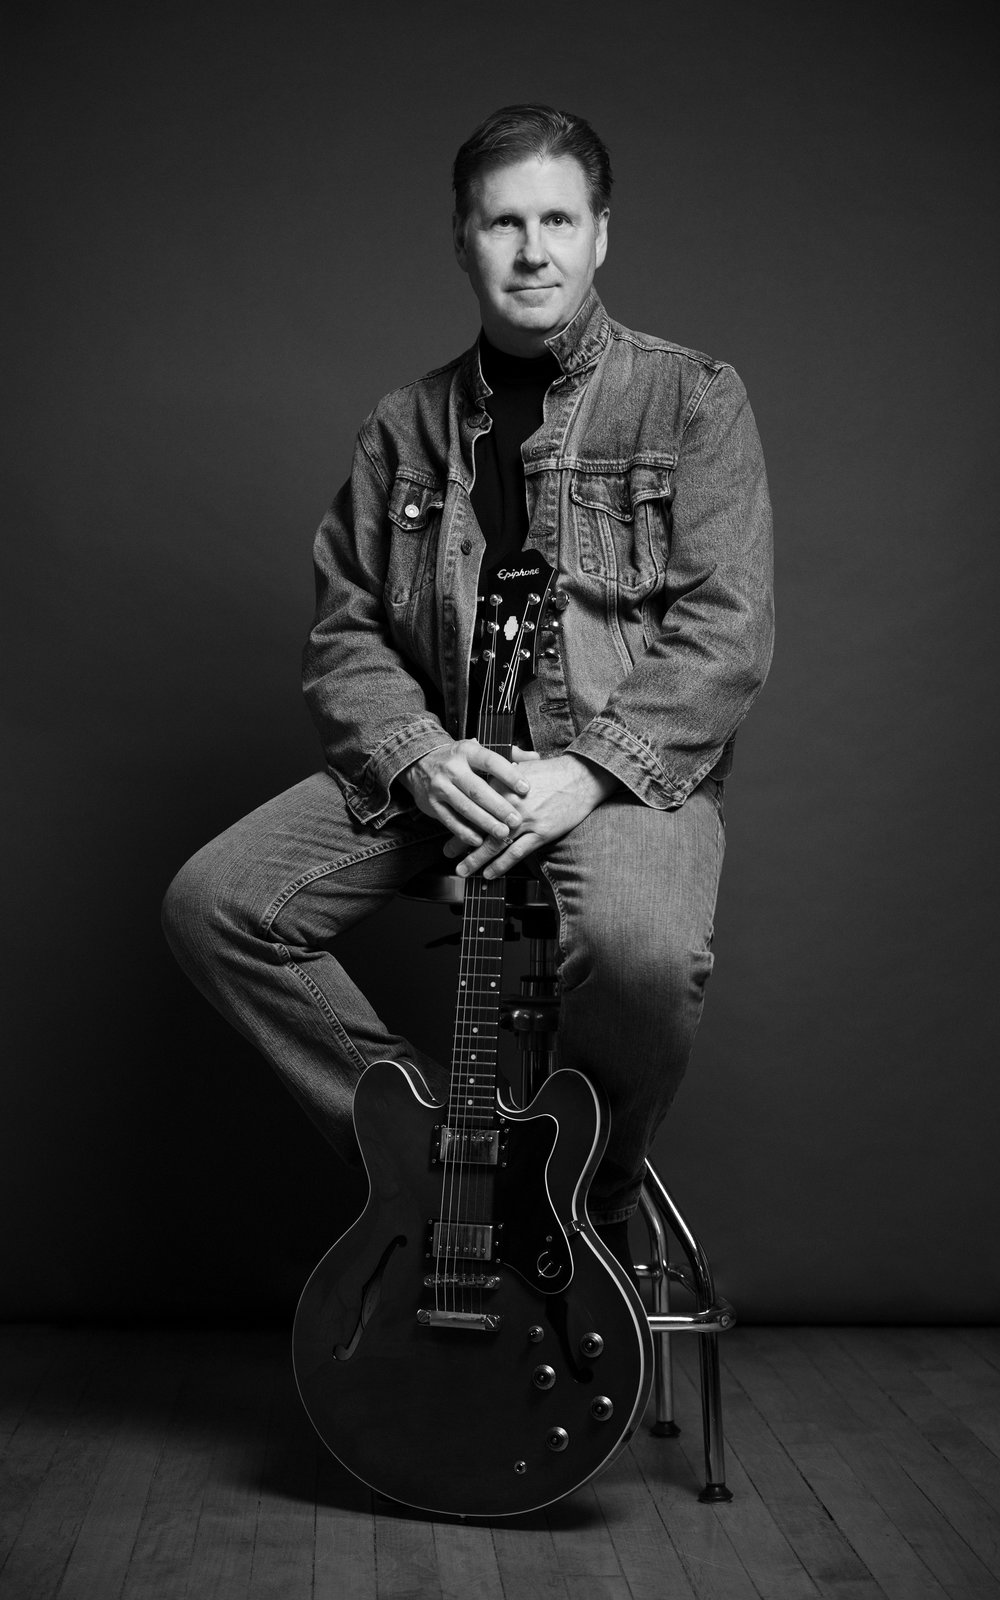 Marta-Hewson-editorial-portraits- denim-jacket-electric-guitar-John-Loeprich.jpg